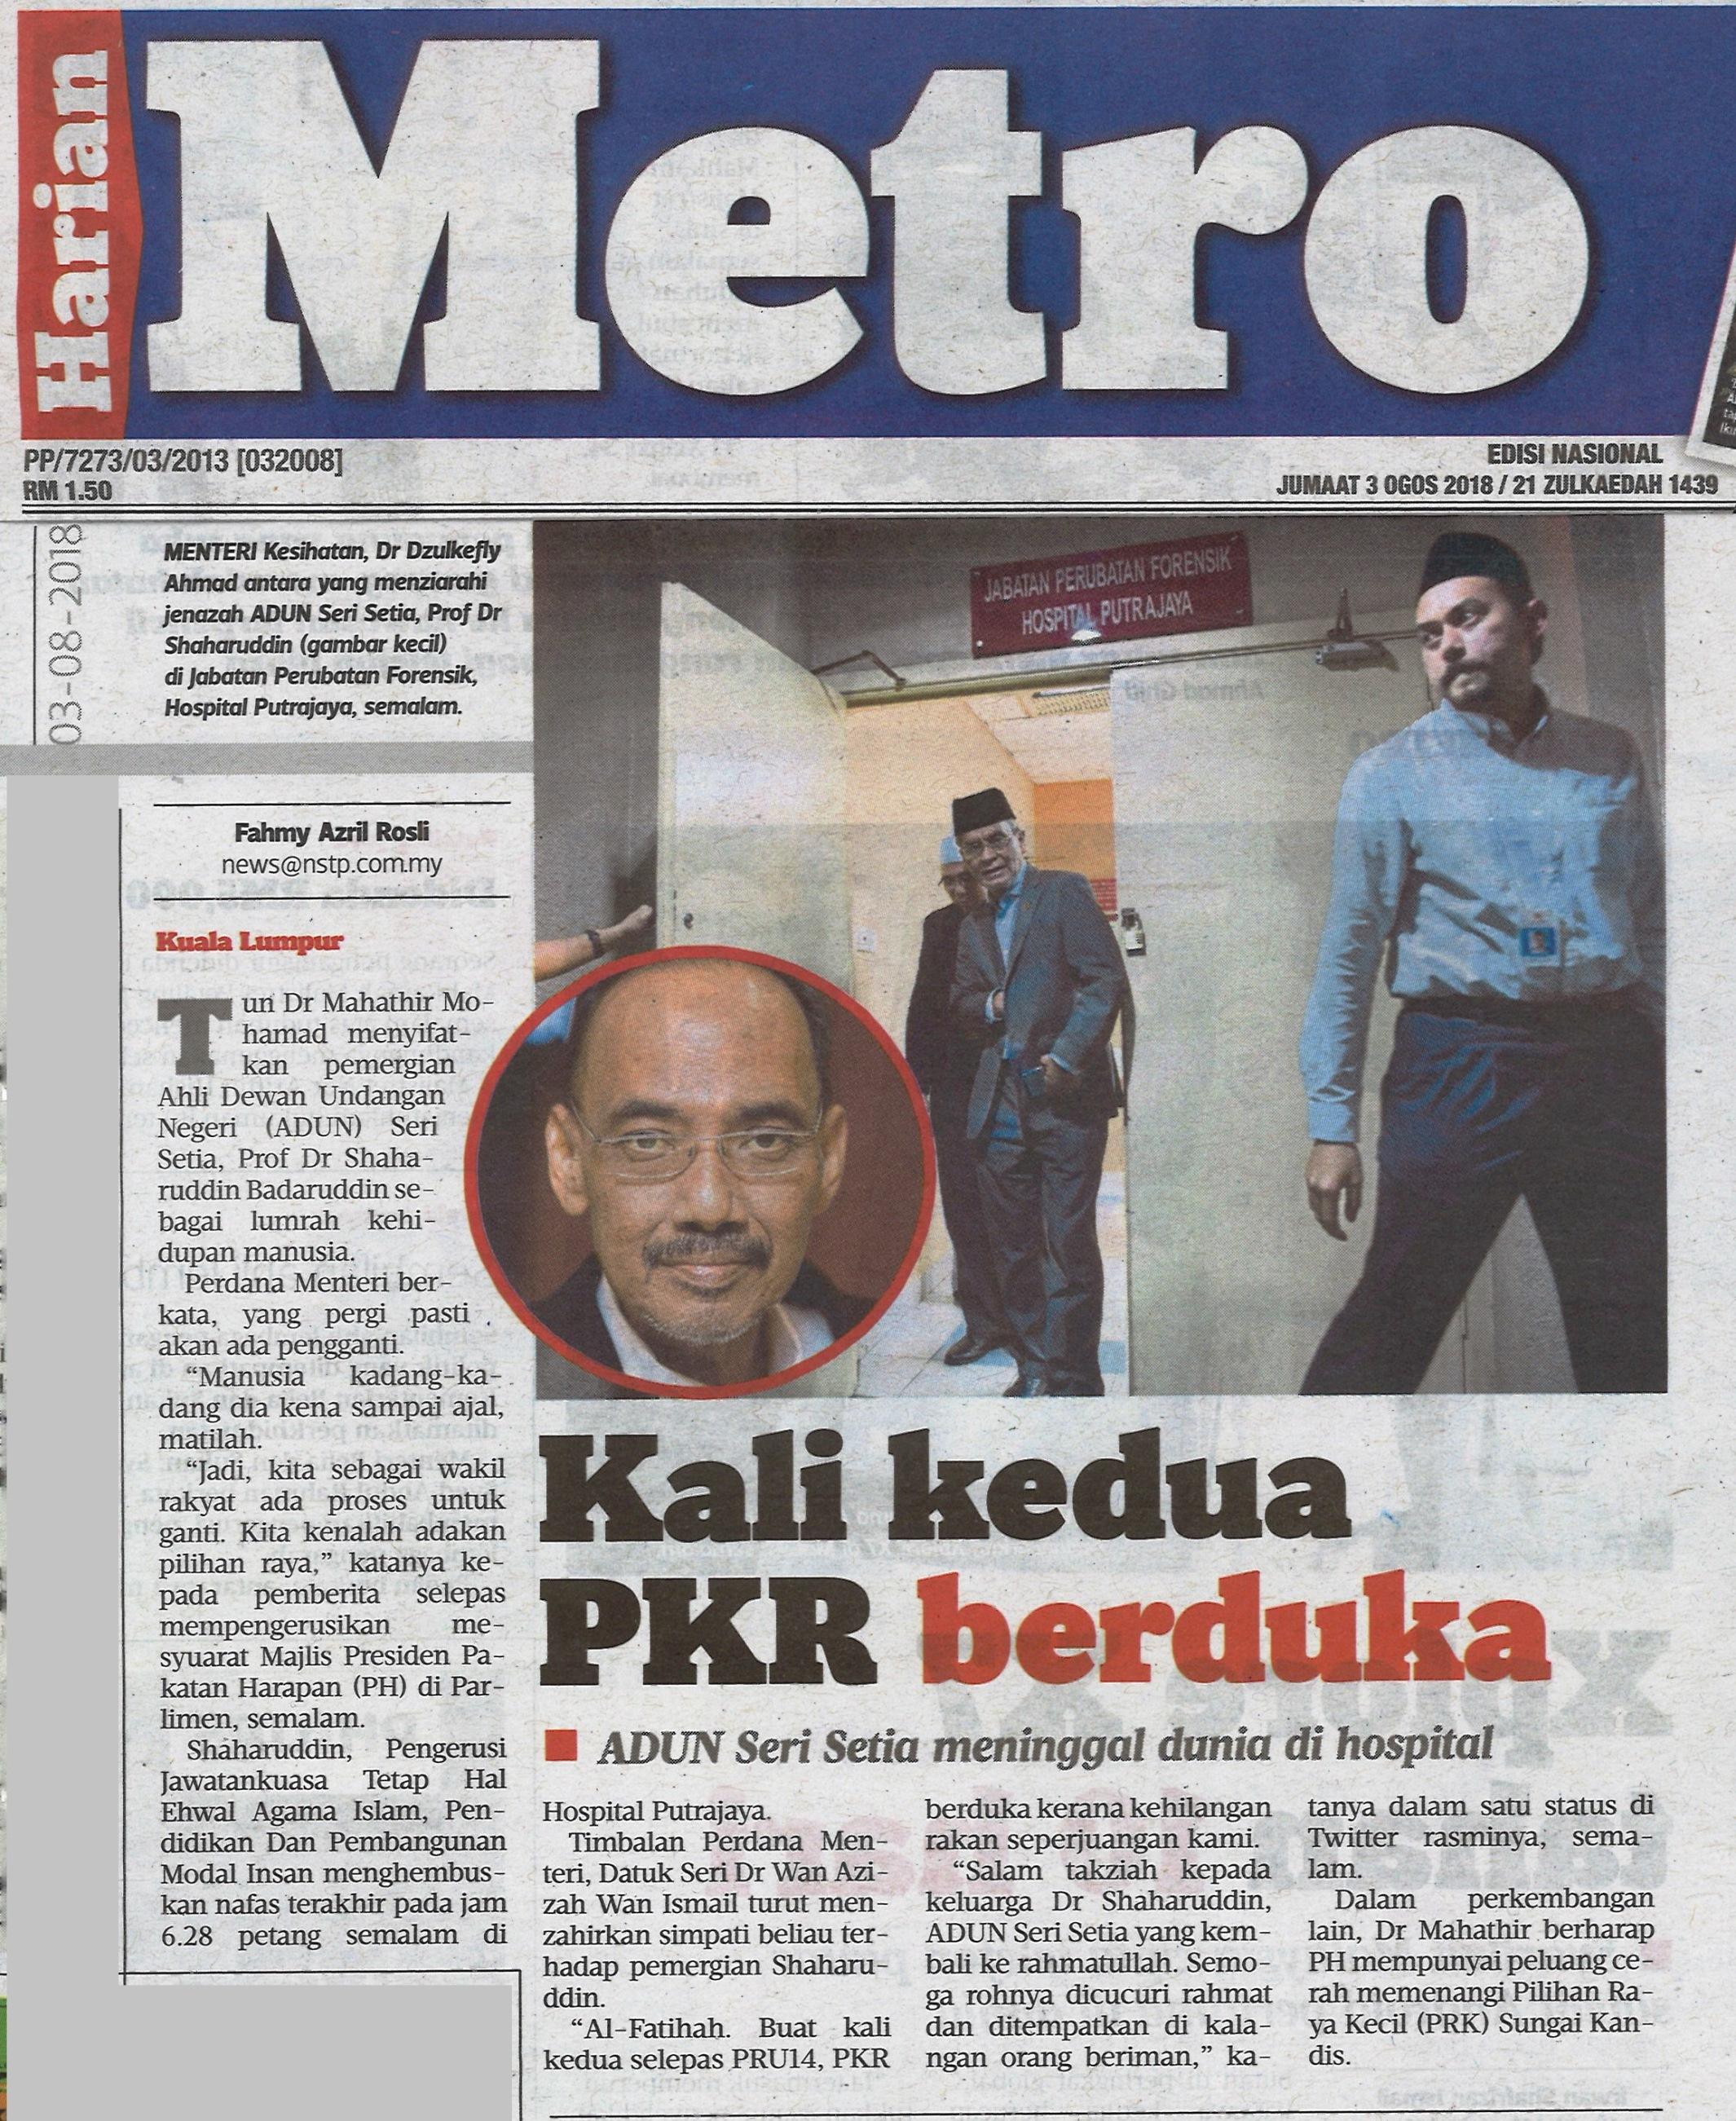 Harian Metro - 3 Ogos 2018 (Jumaat)